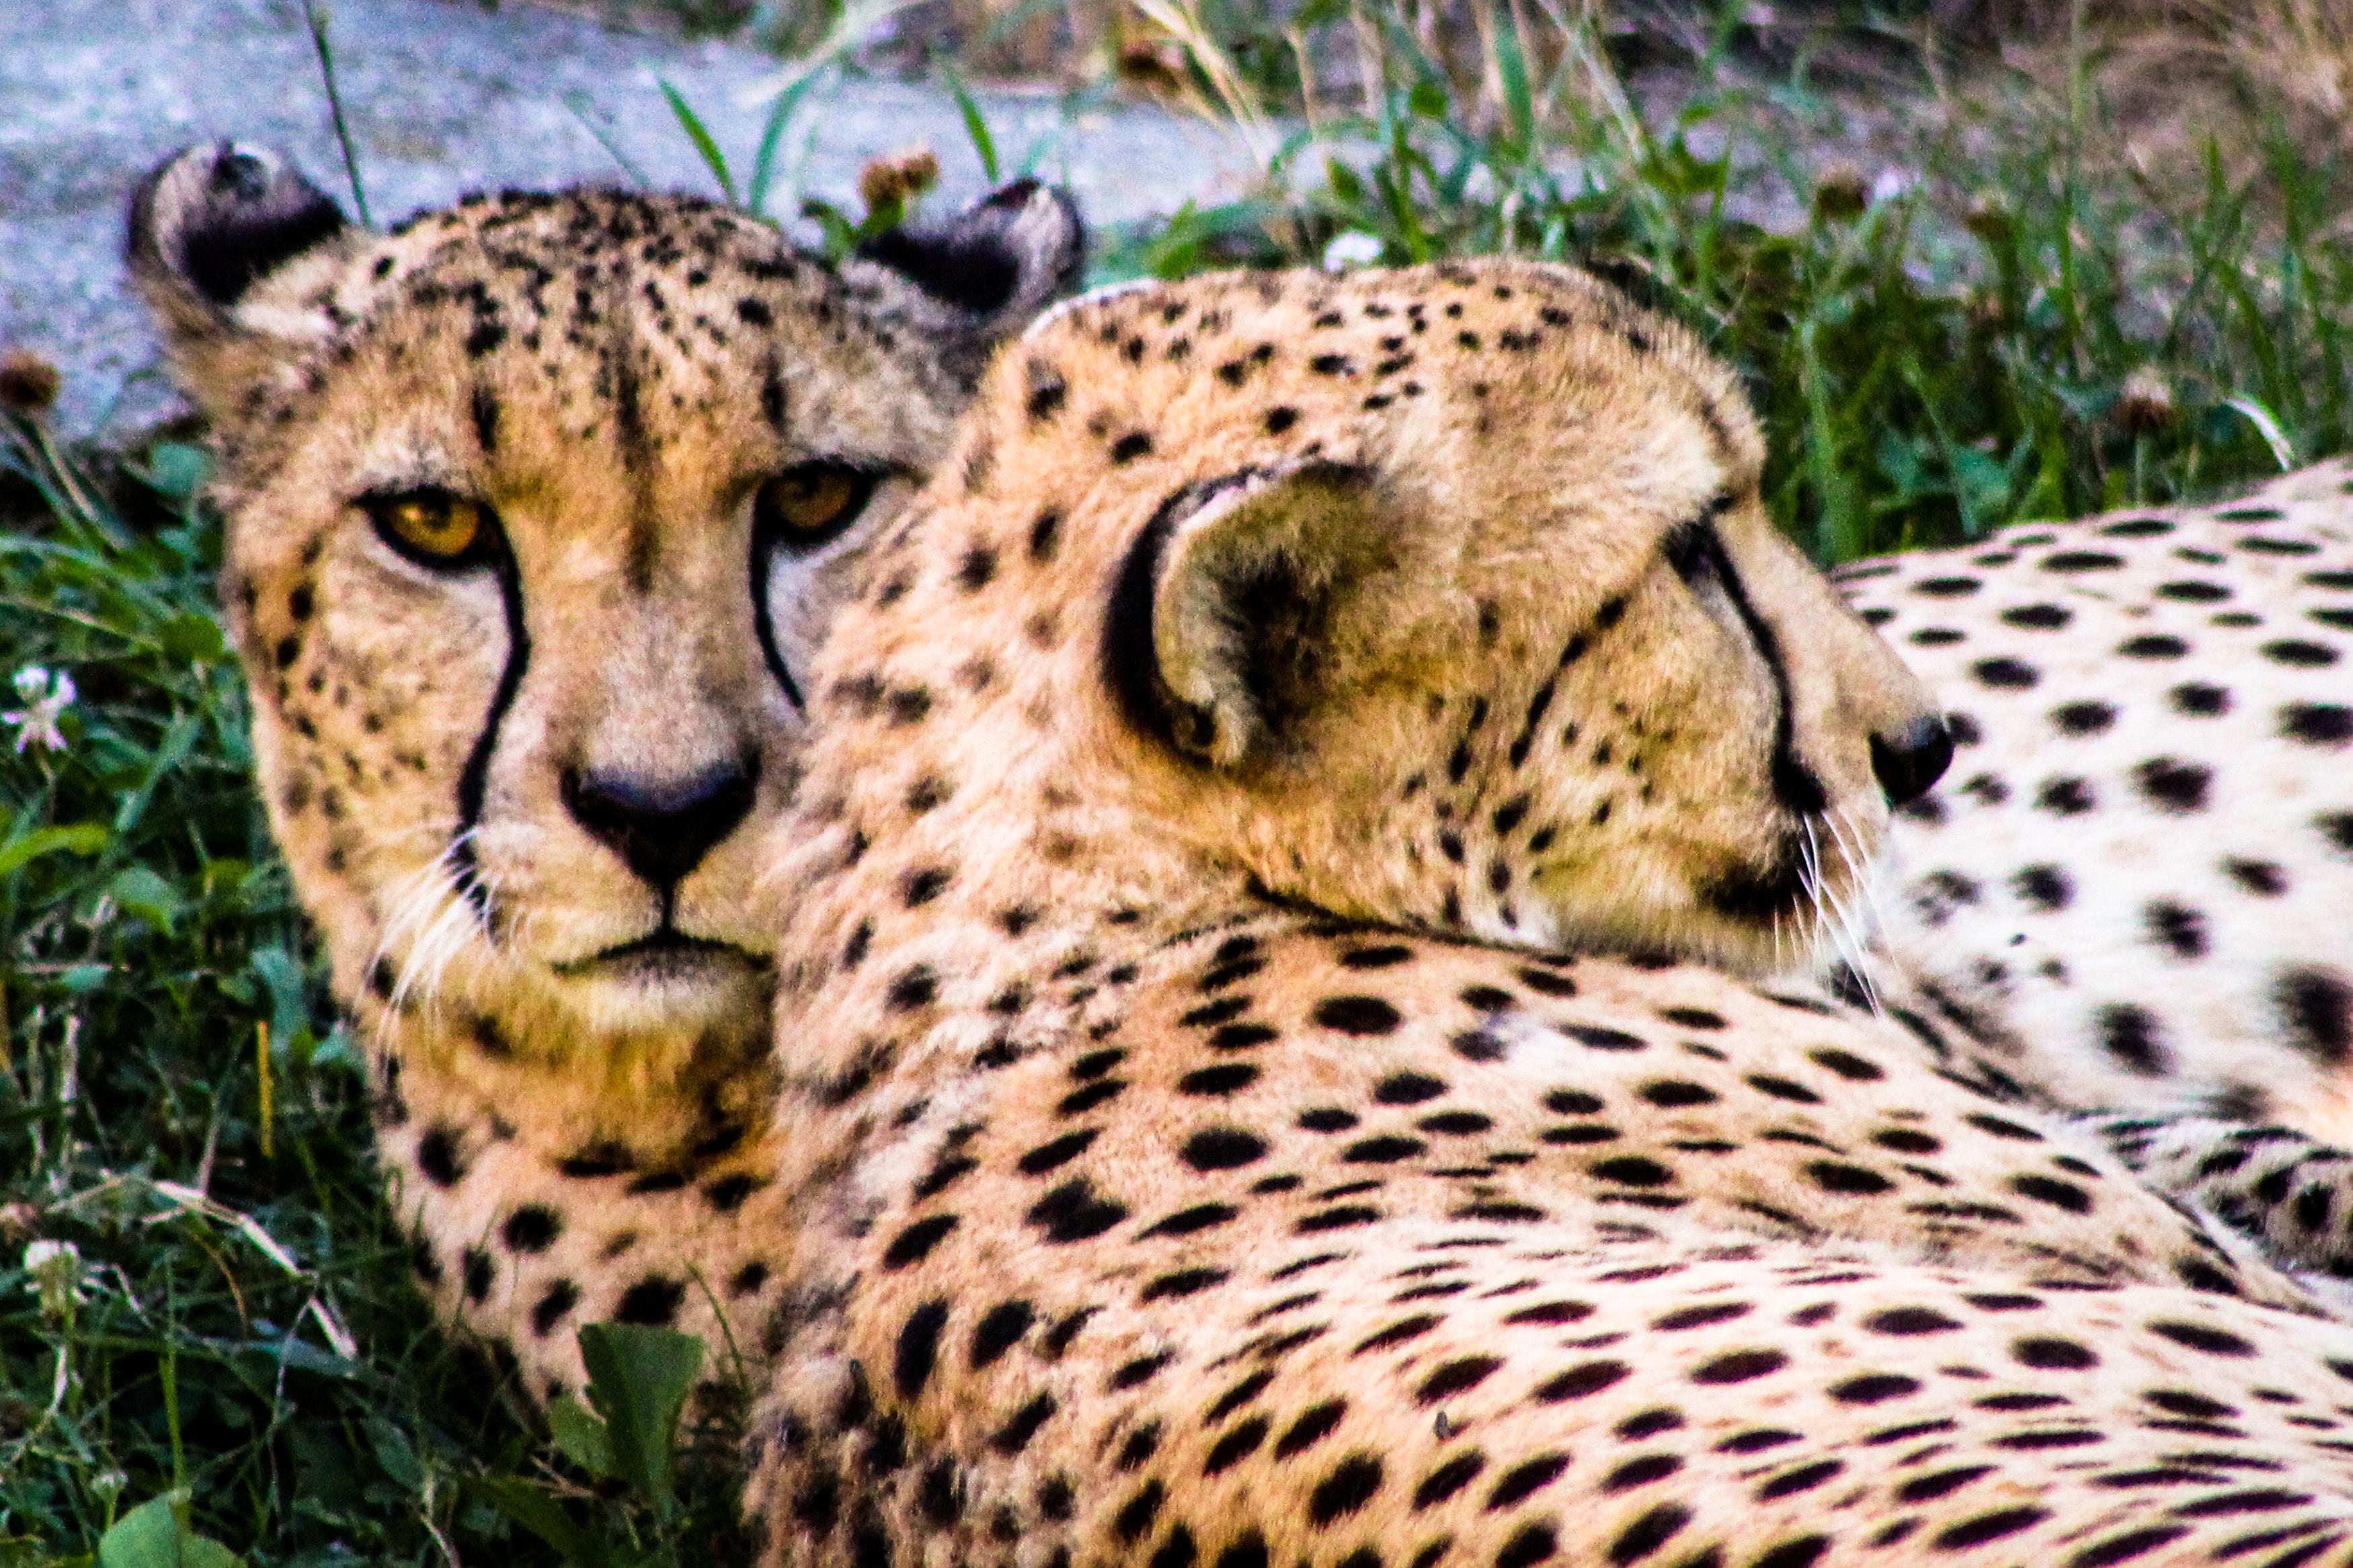 two cheetahs lying on green grass